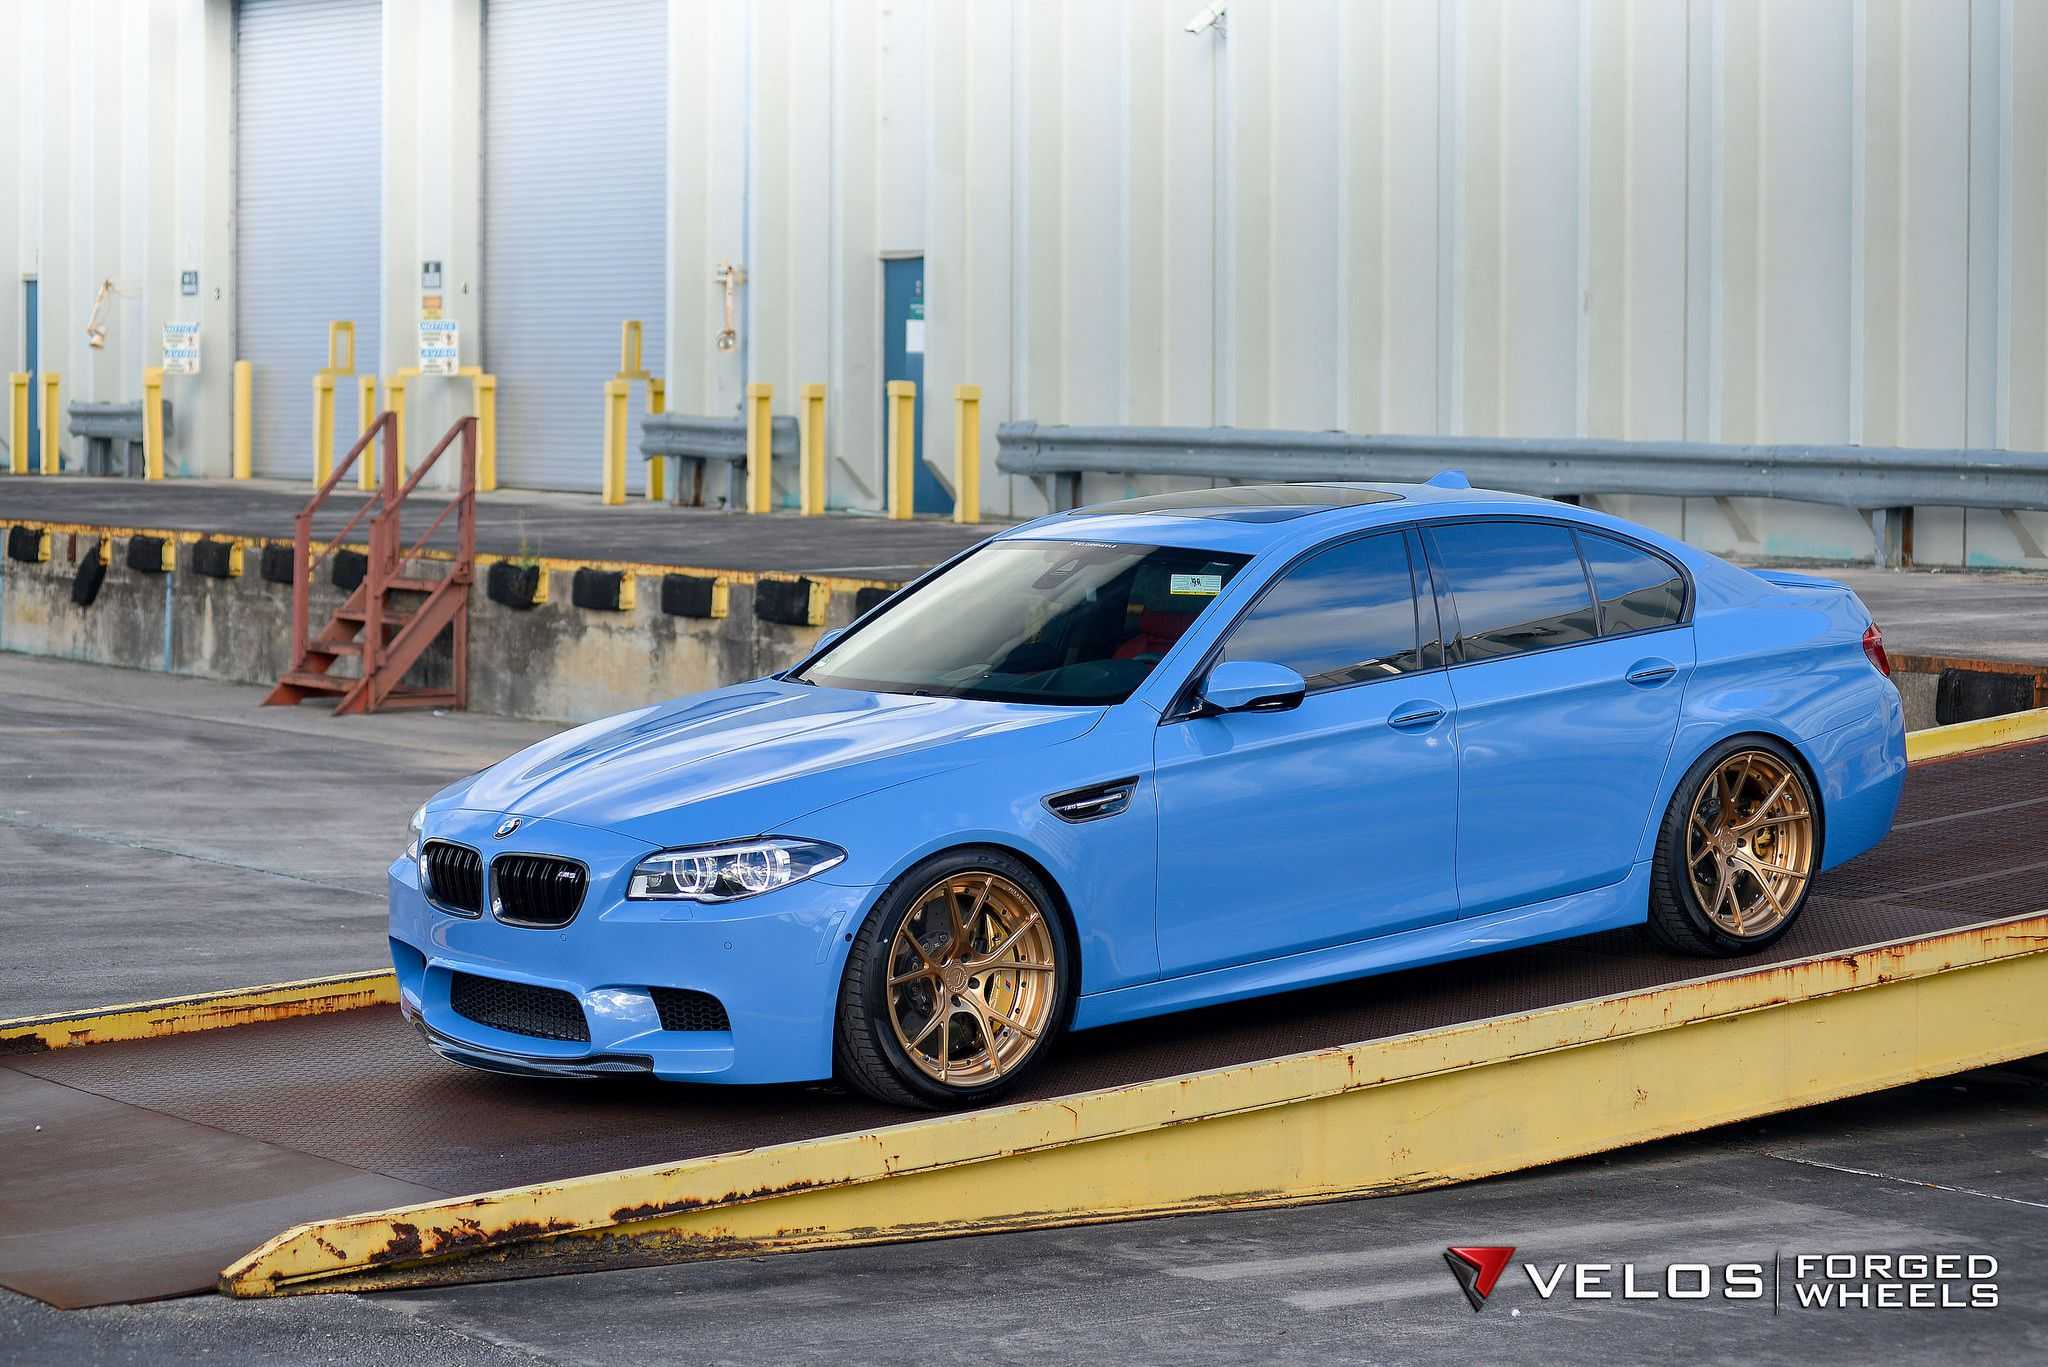 bmw f10 m5 sedan velos design wheels light blue moster bmw f10 5 series sedan. Black Bedroom Furniture Sets. Home Design Ideas